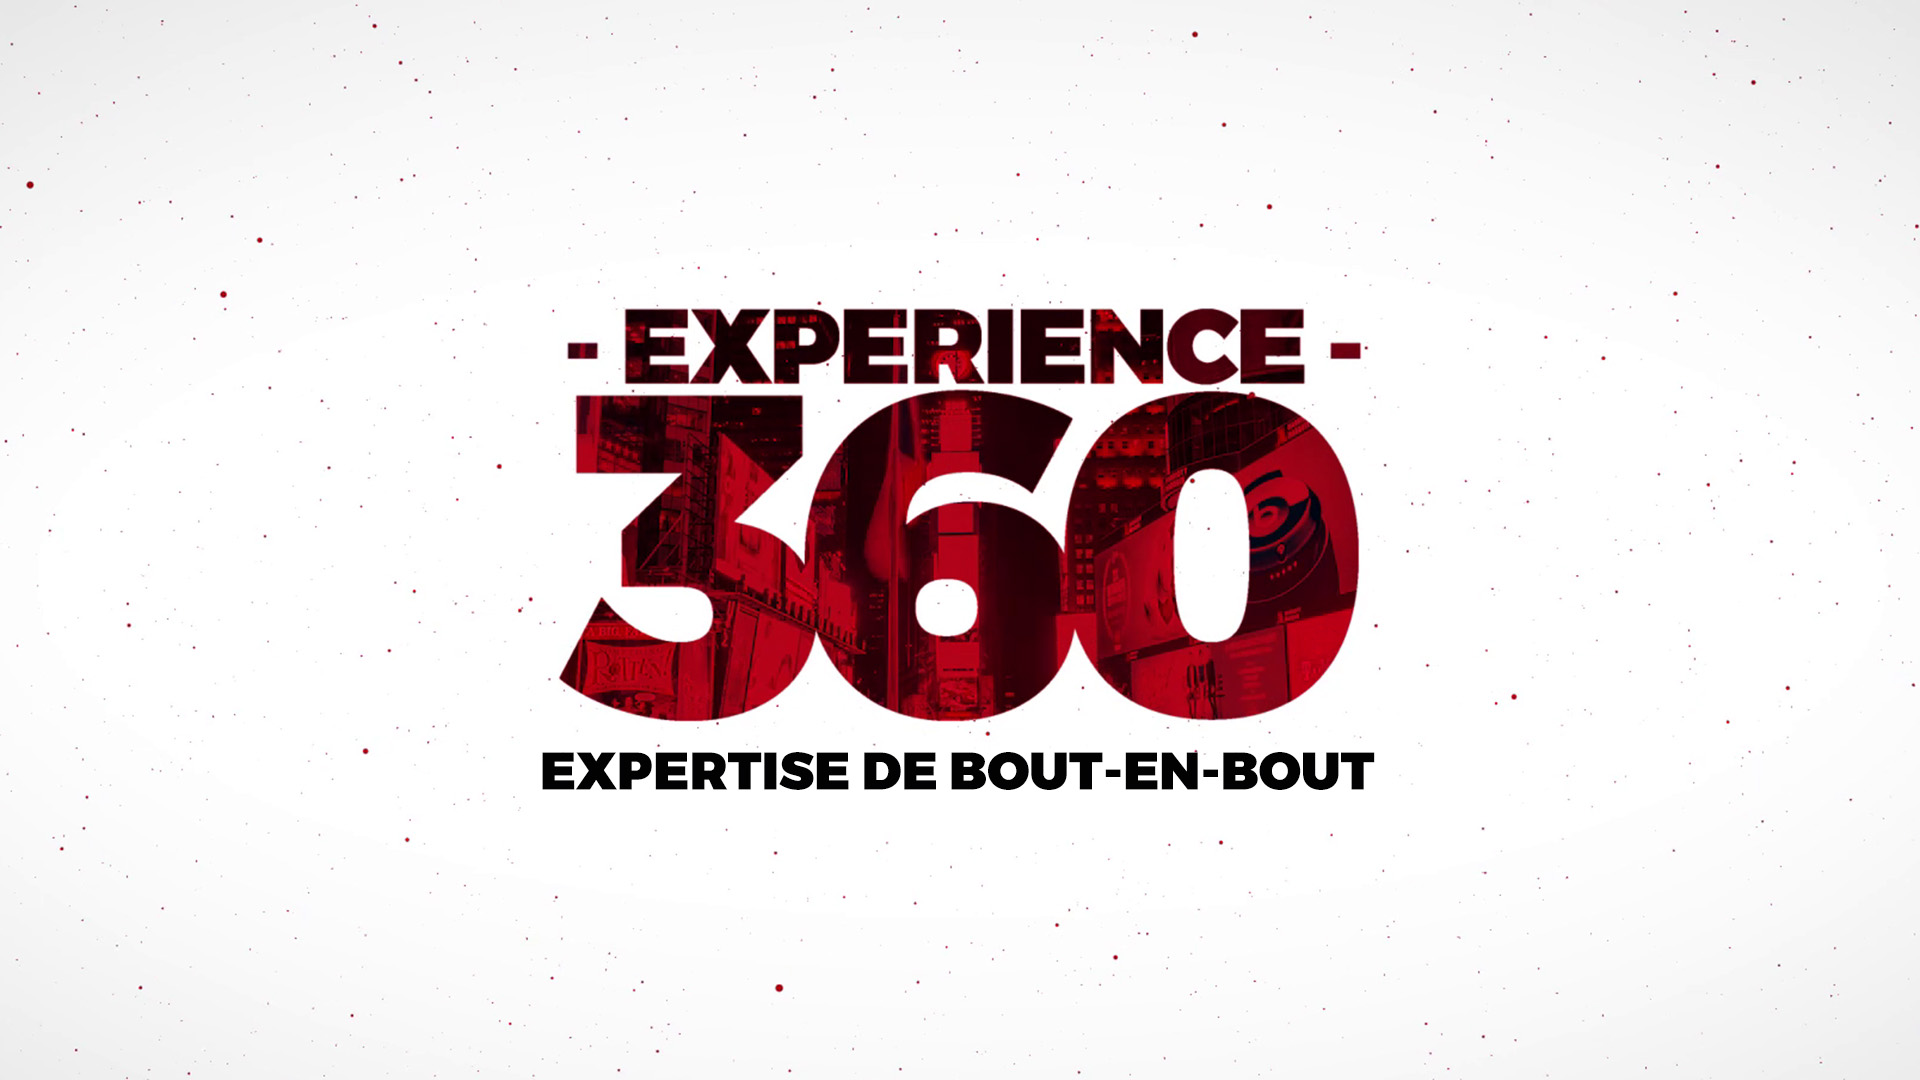 miniature360